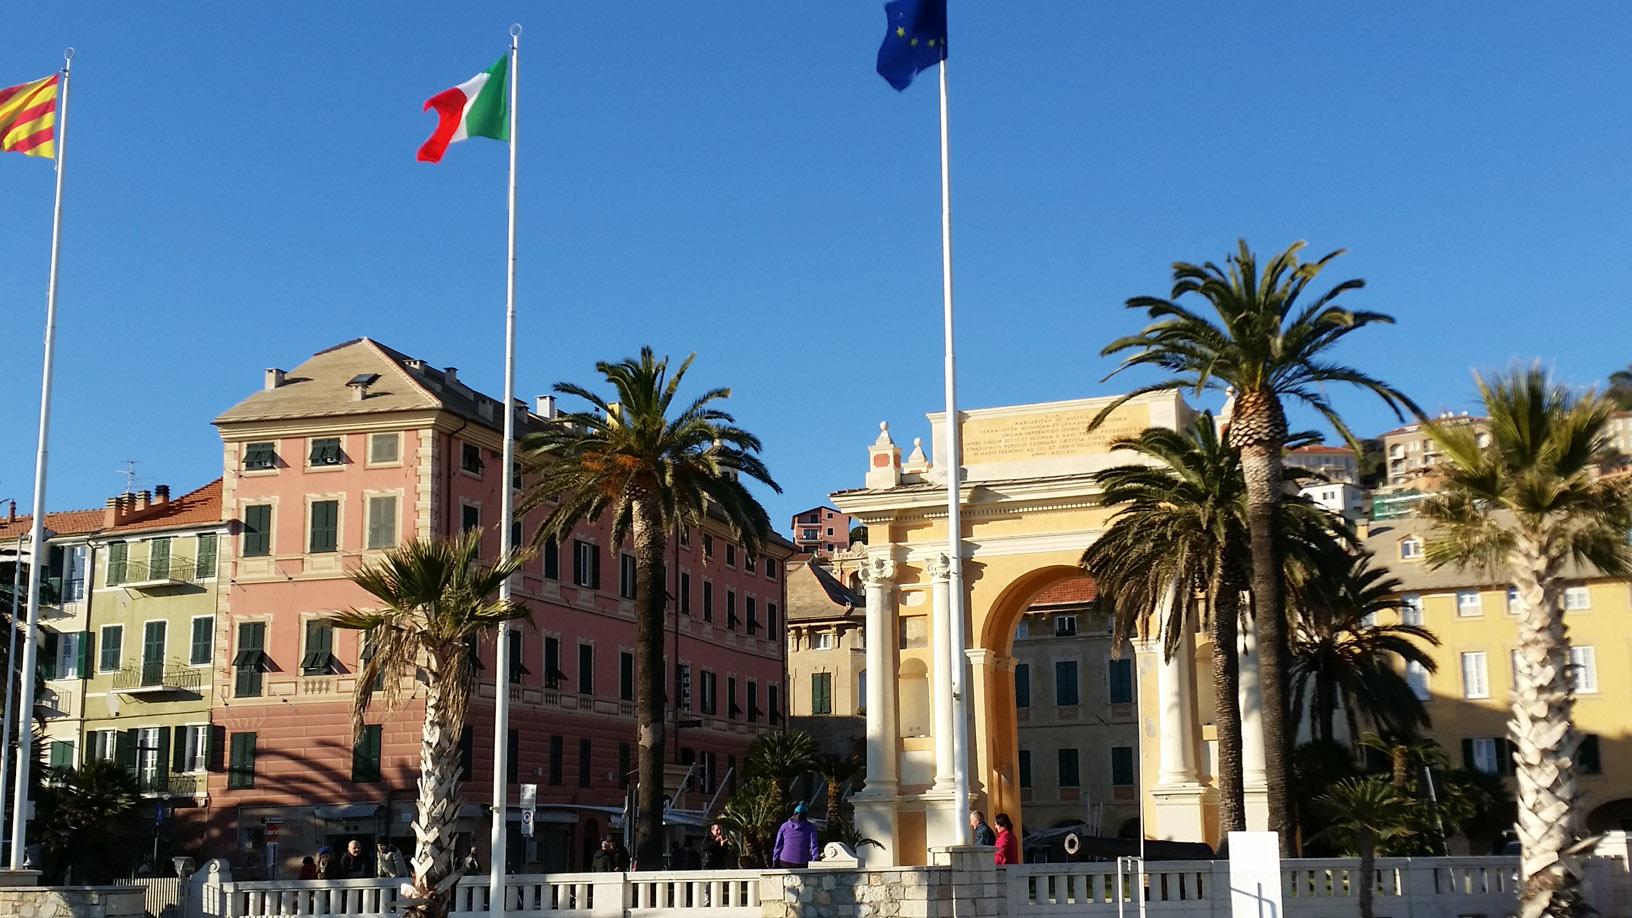 Finale Ligure - Piazza Vittorio Emanuele